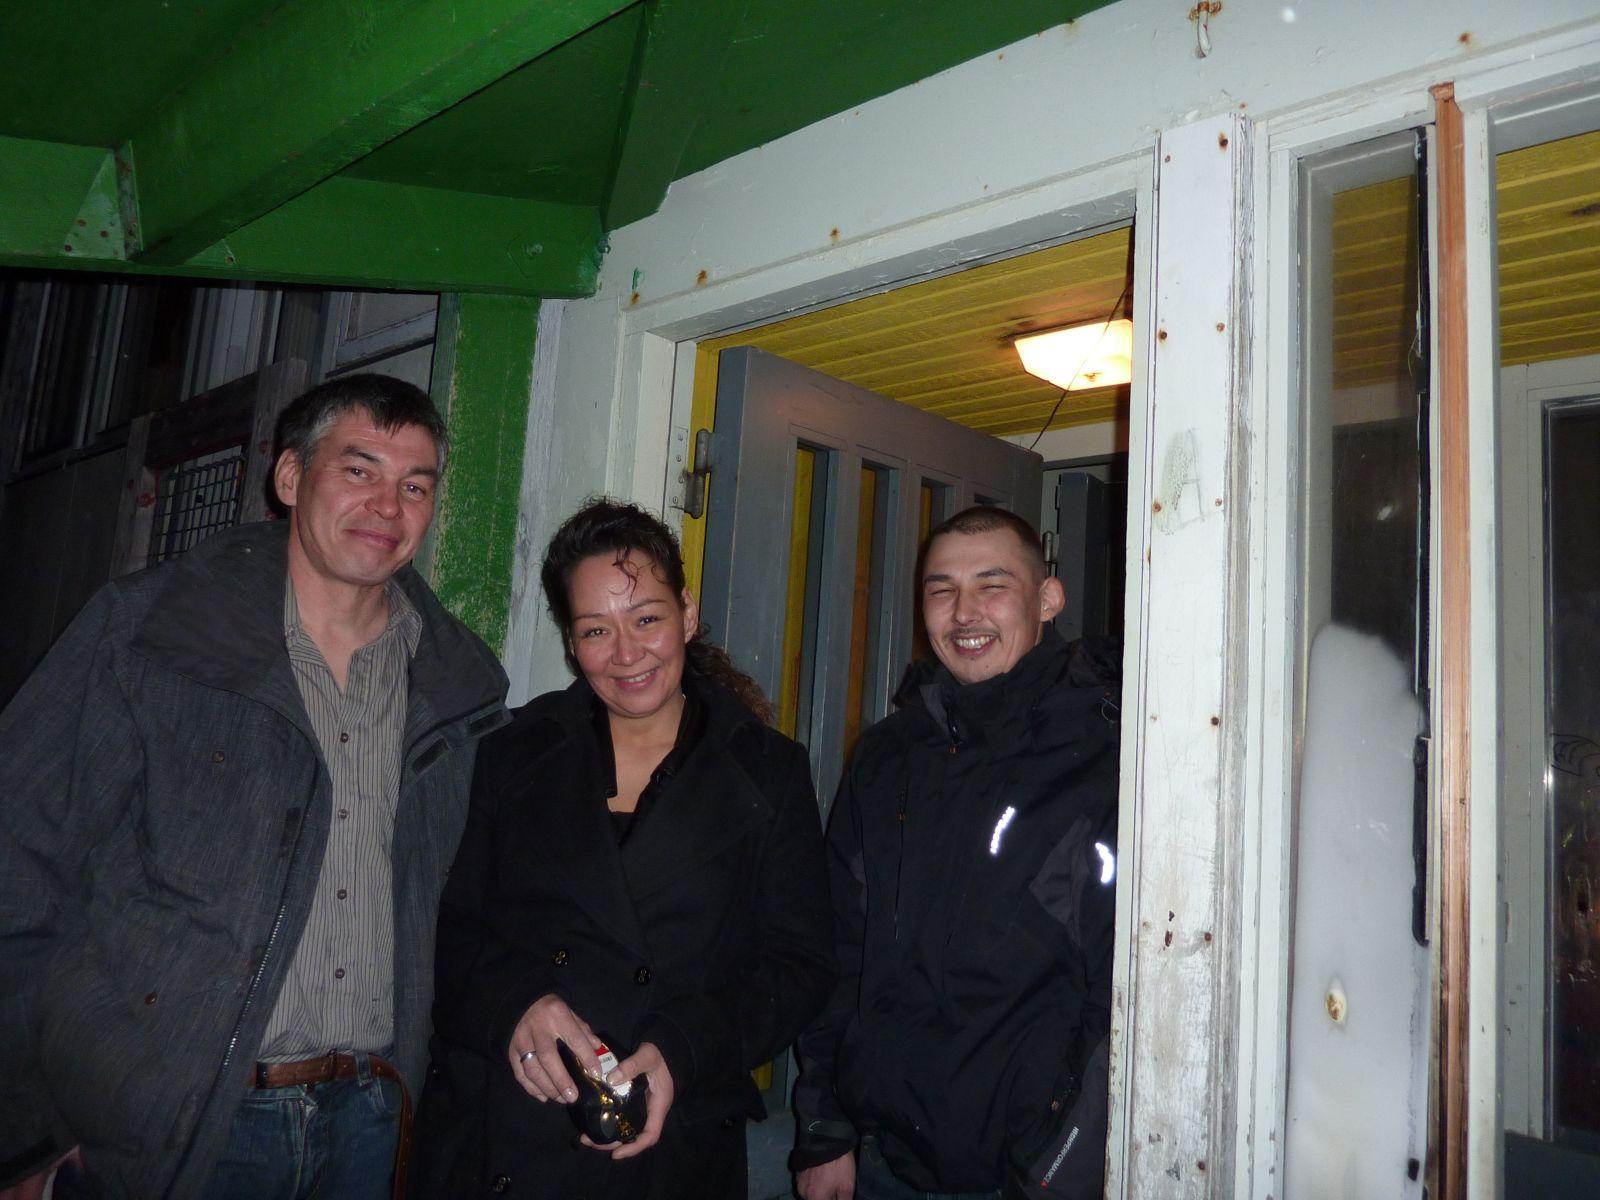 2010-03-14-0328_Jens Larsen; Peter_; Peters_Kone